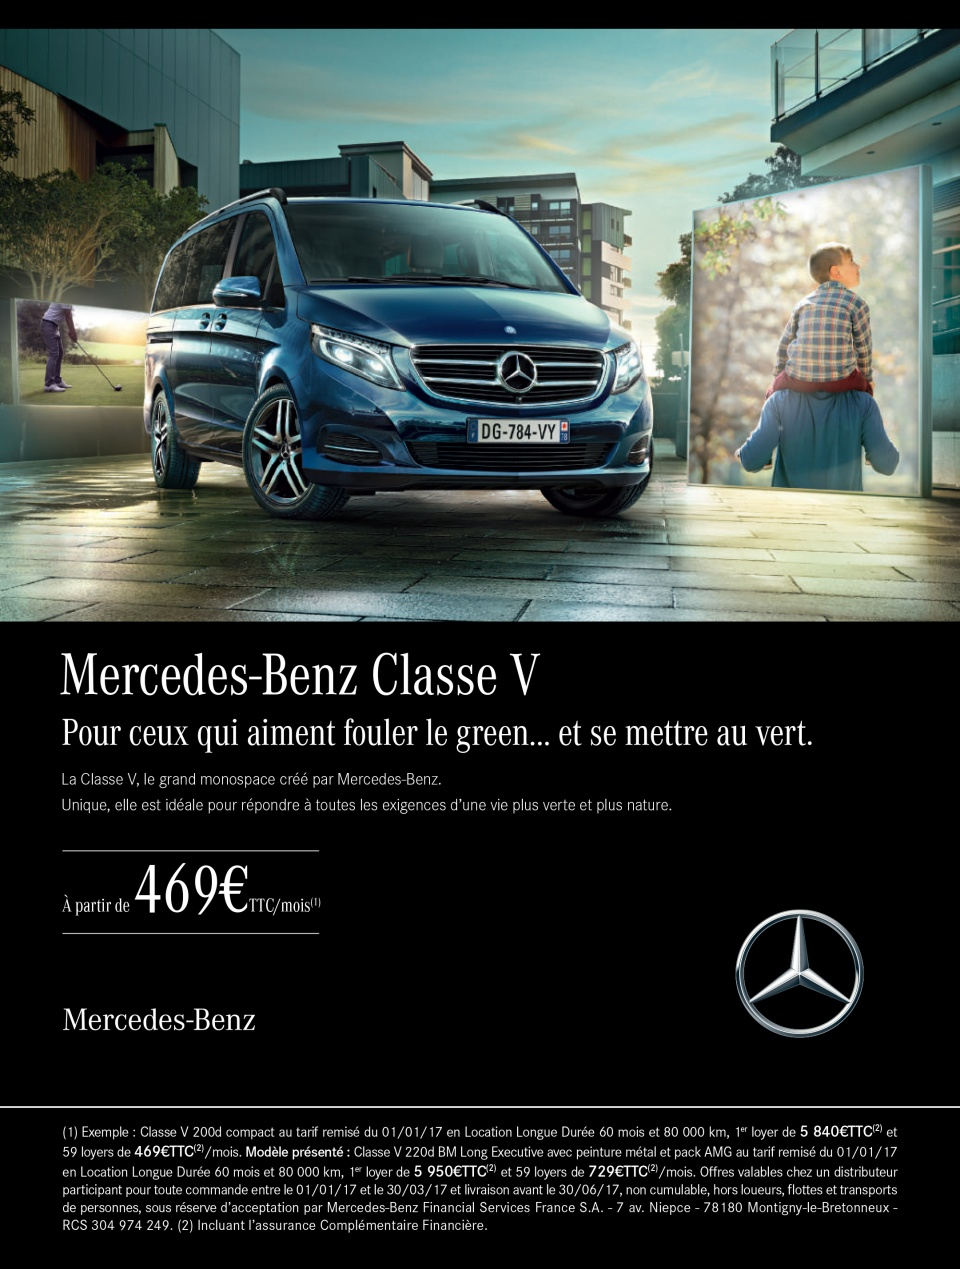 Mercedes Classe V #3